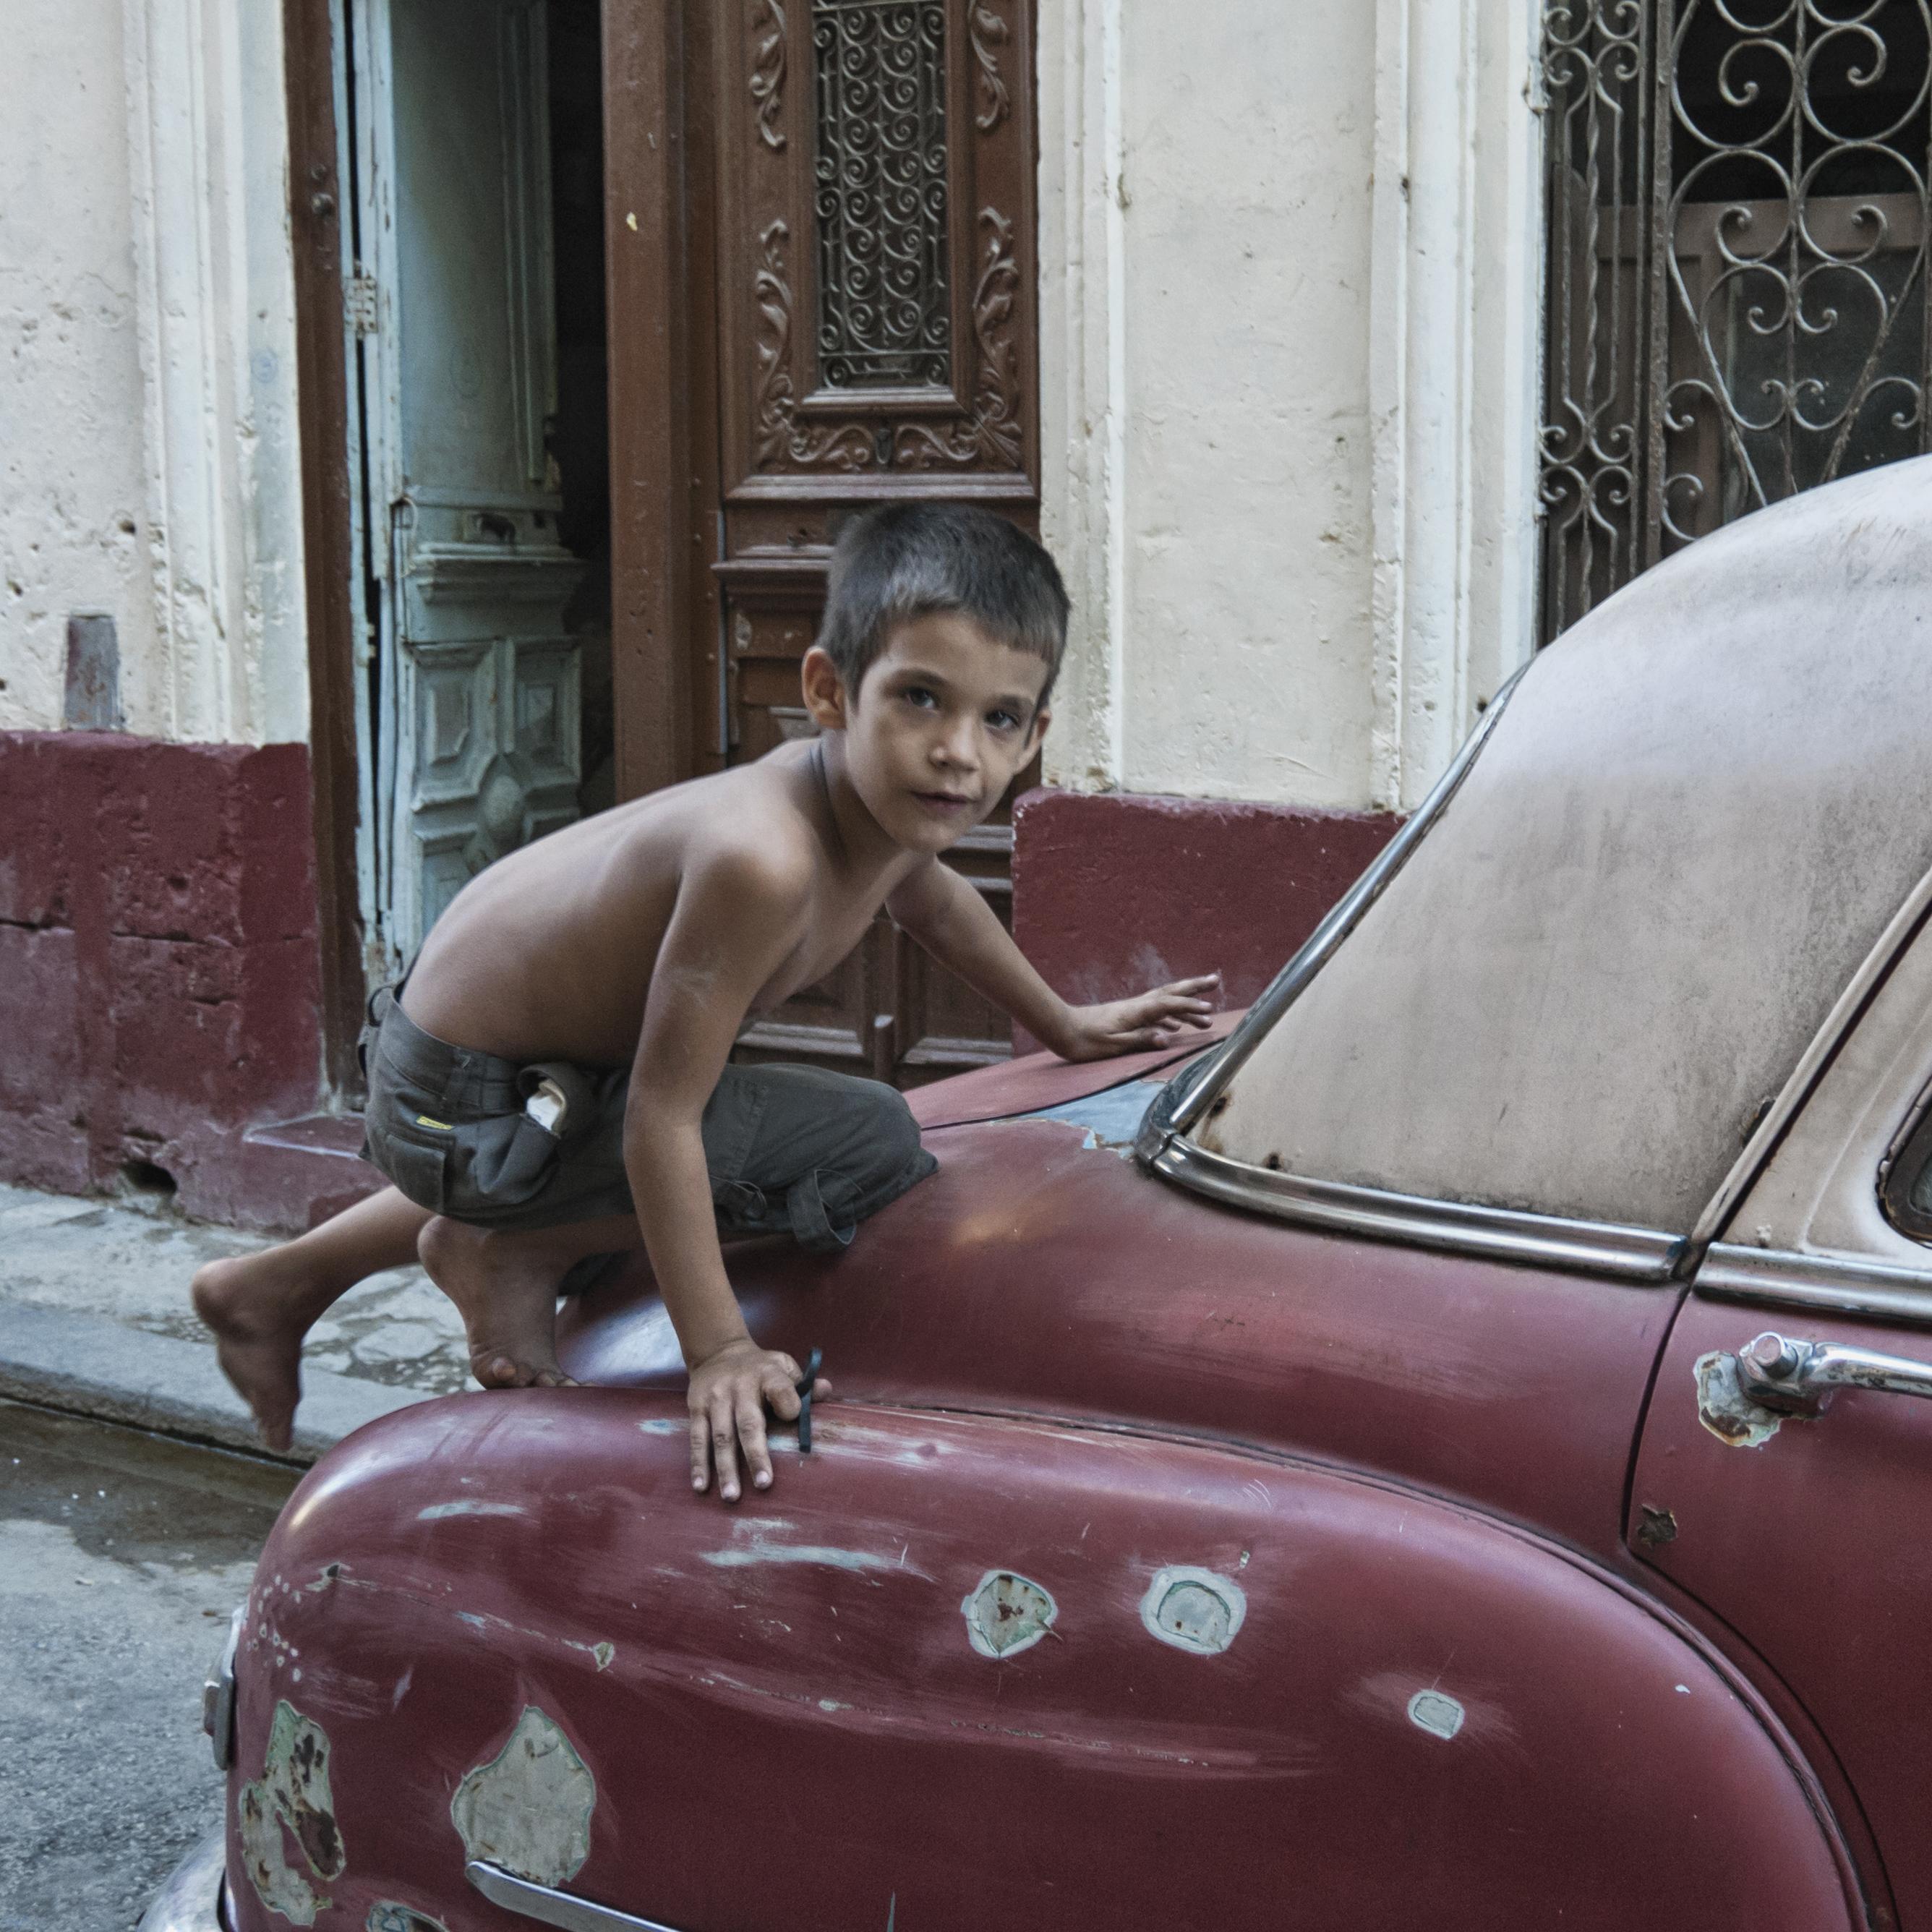 Streetlife - Havana, Cuba